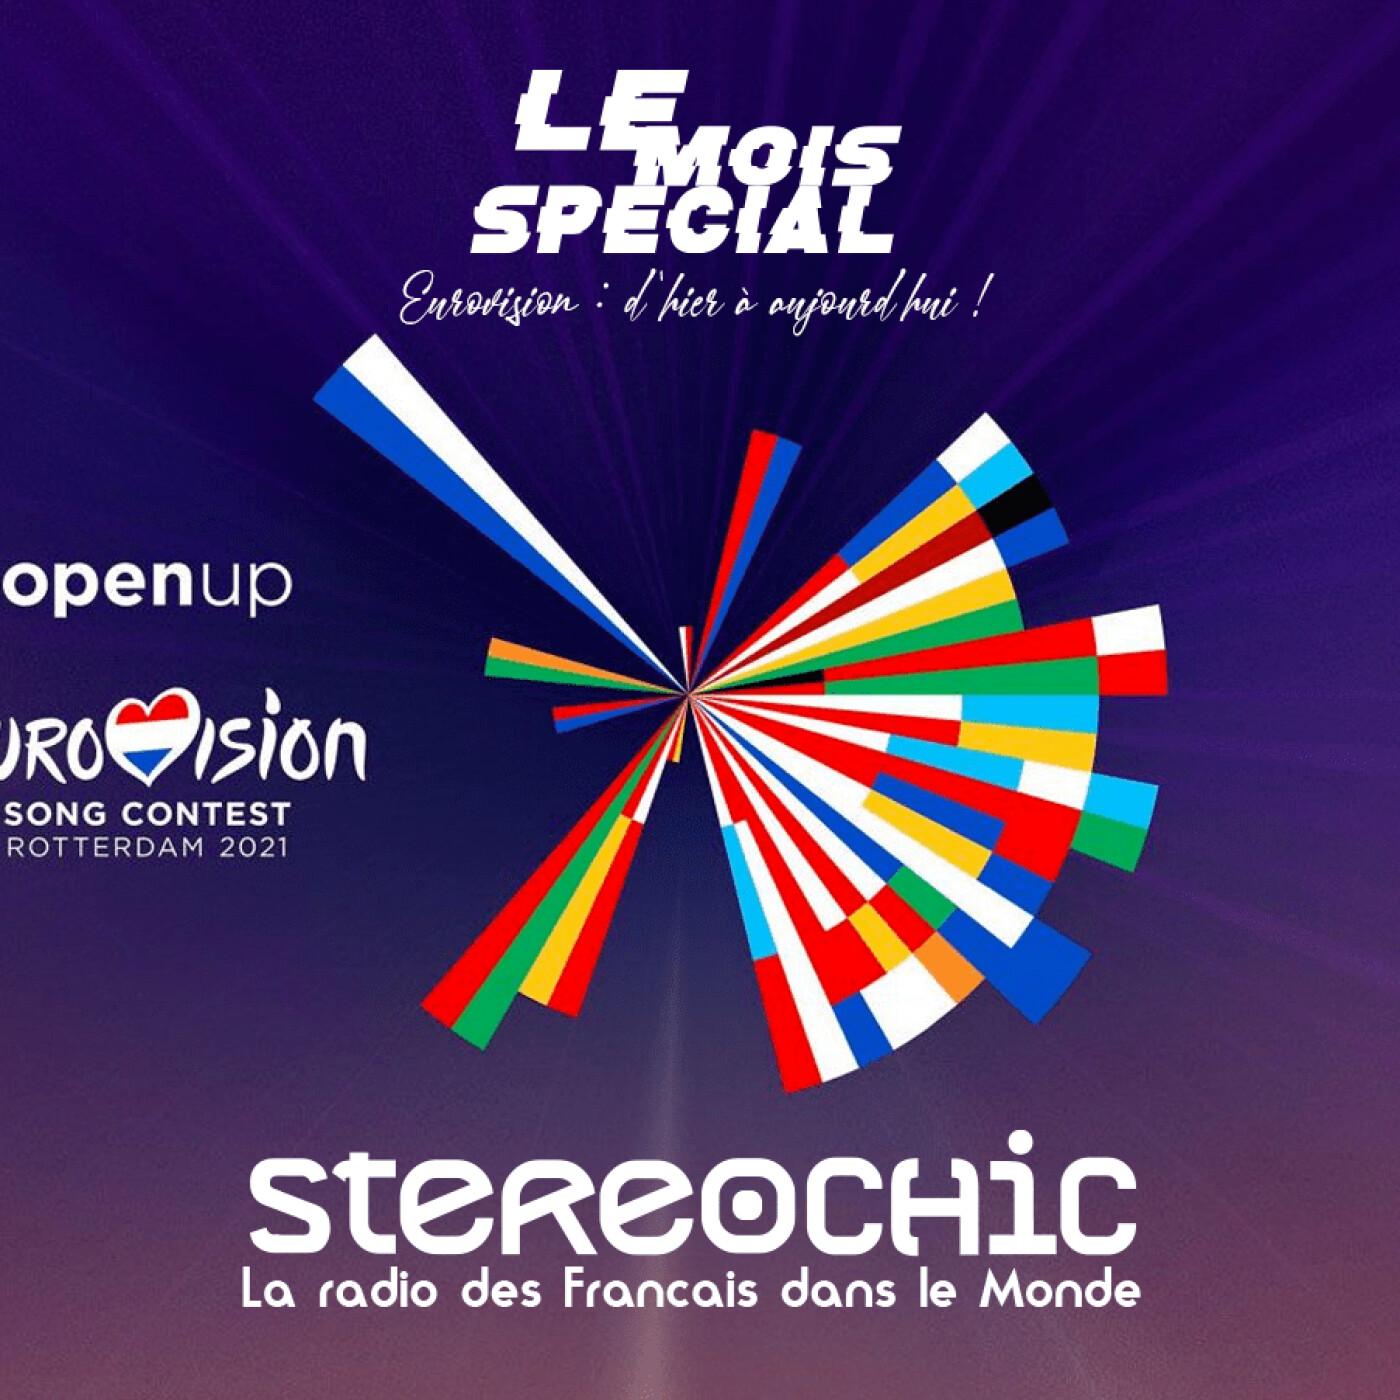 Mois Special Eurovision, Benoît parle des origines du concours - 26 04 21 - StereoChic Radio